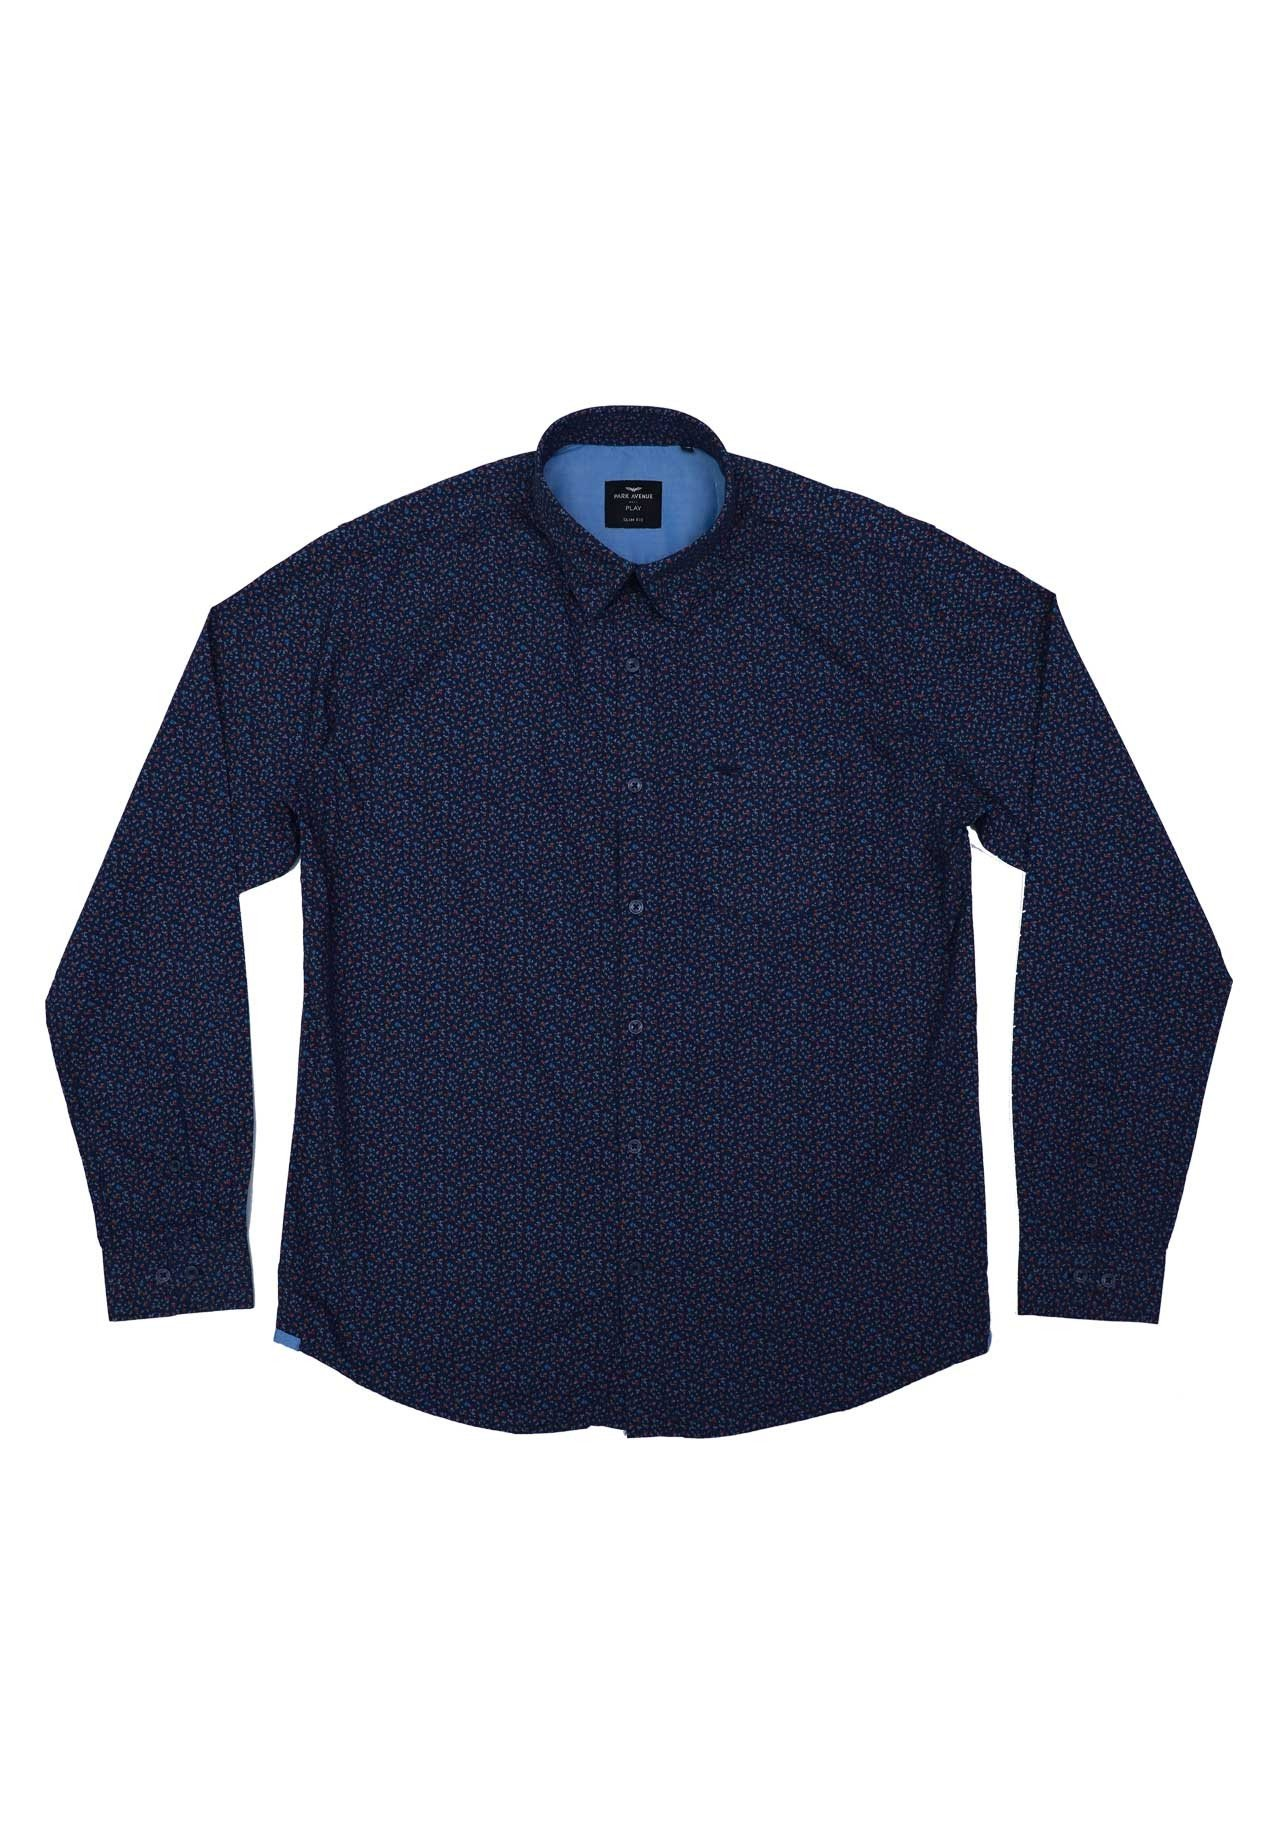 Park Avenue PCSA01886-N4 Mens Shirt, Size 40